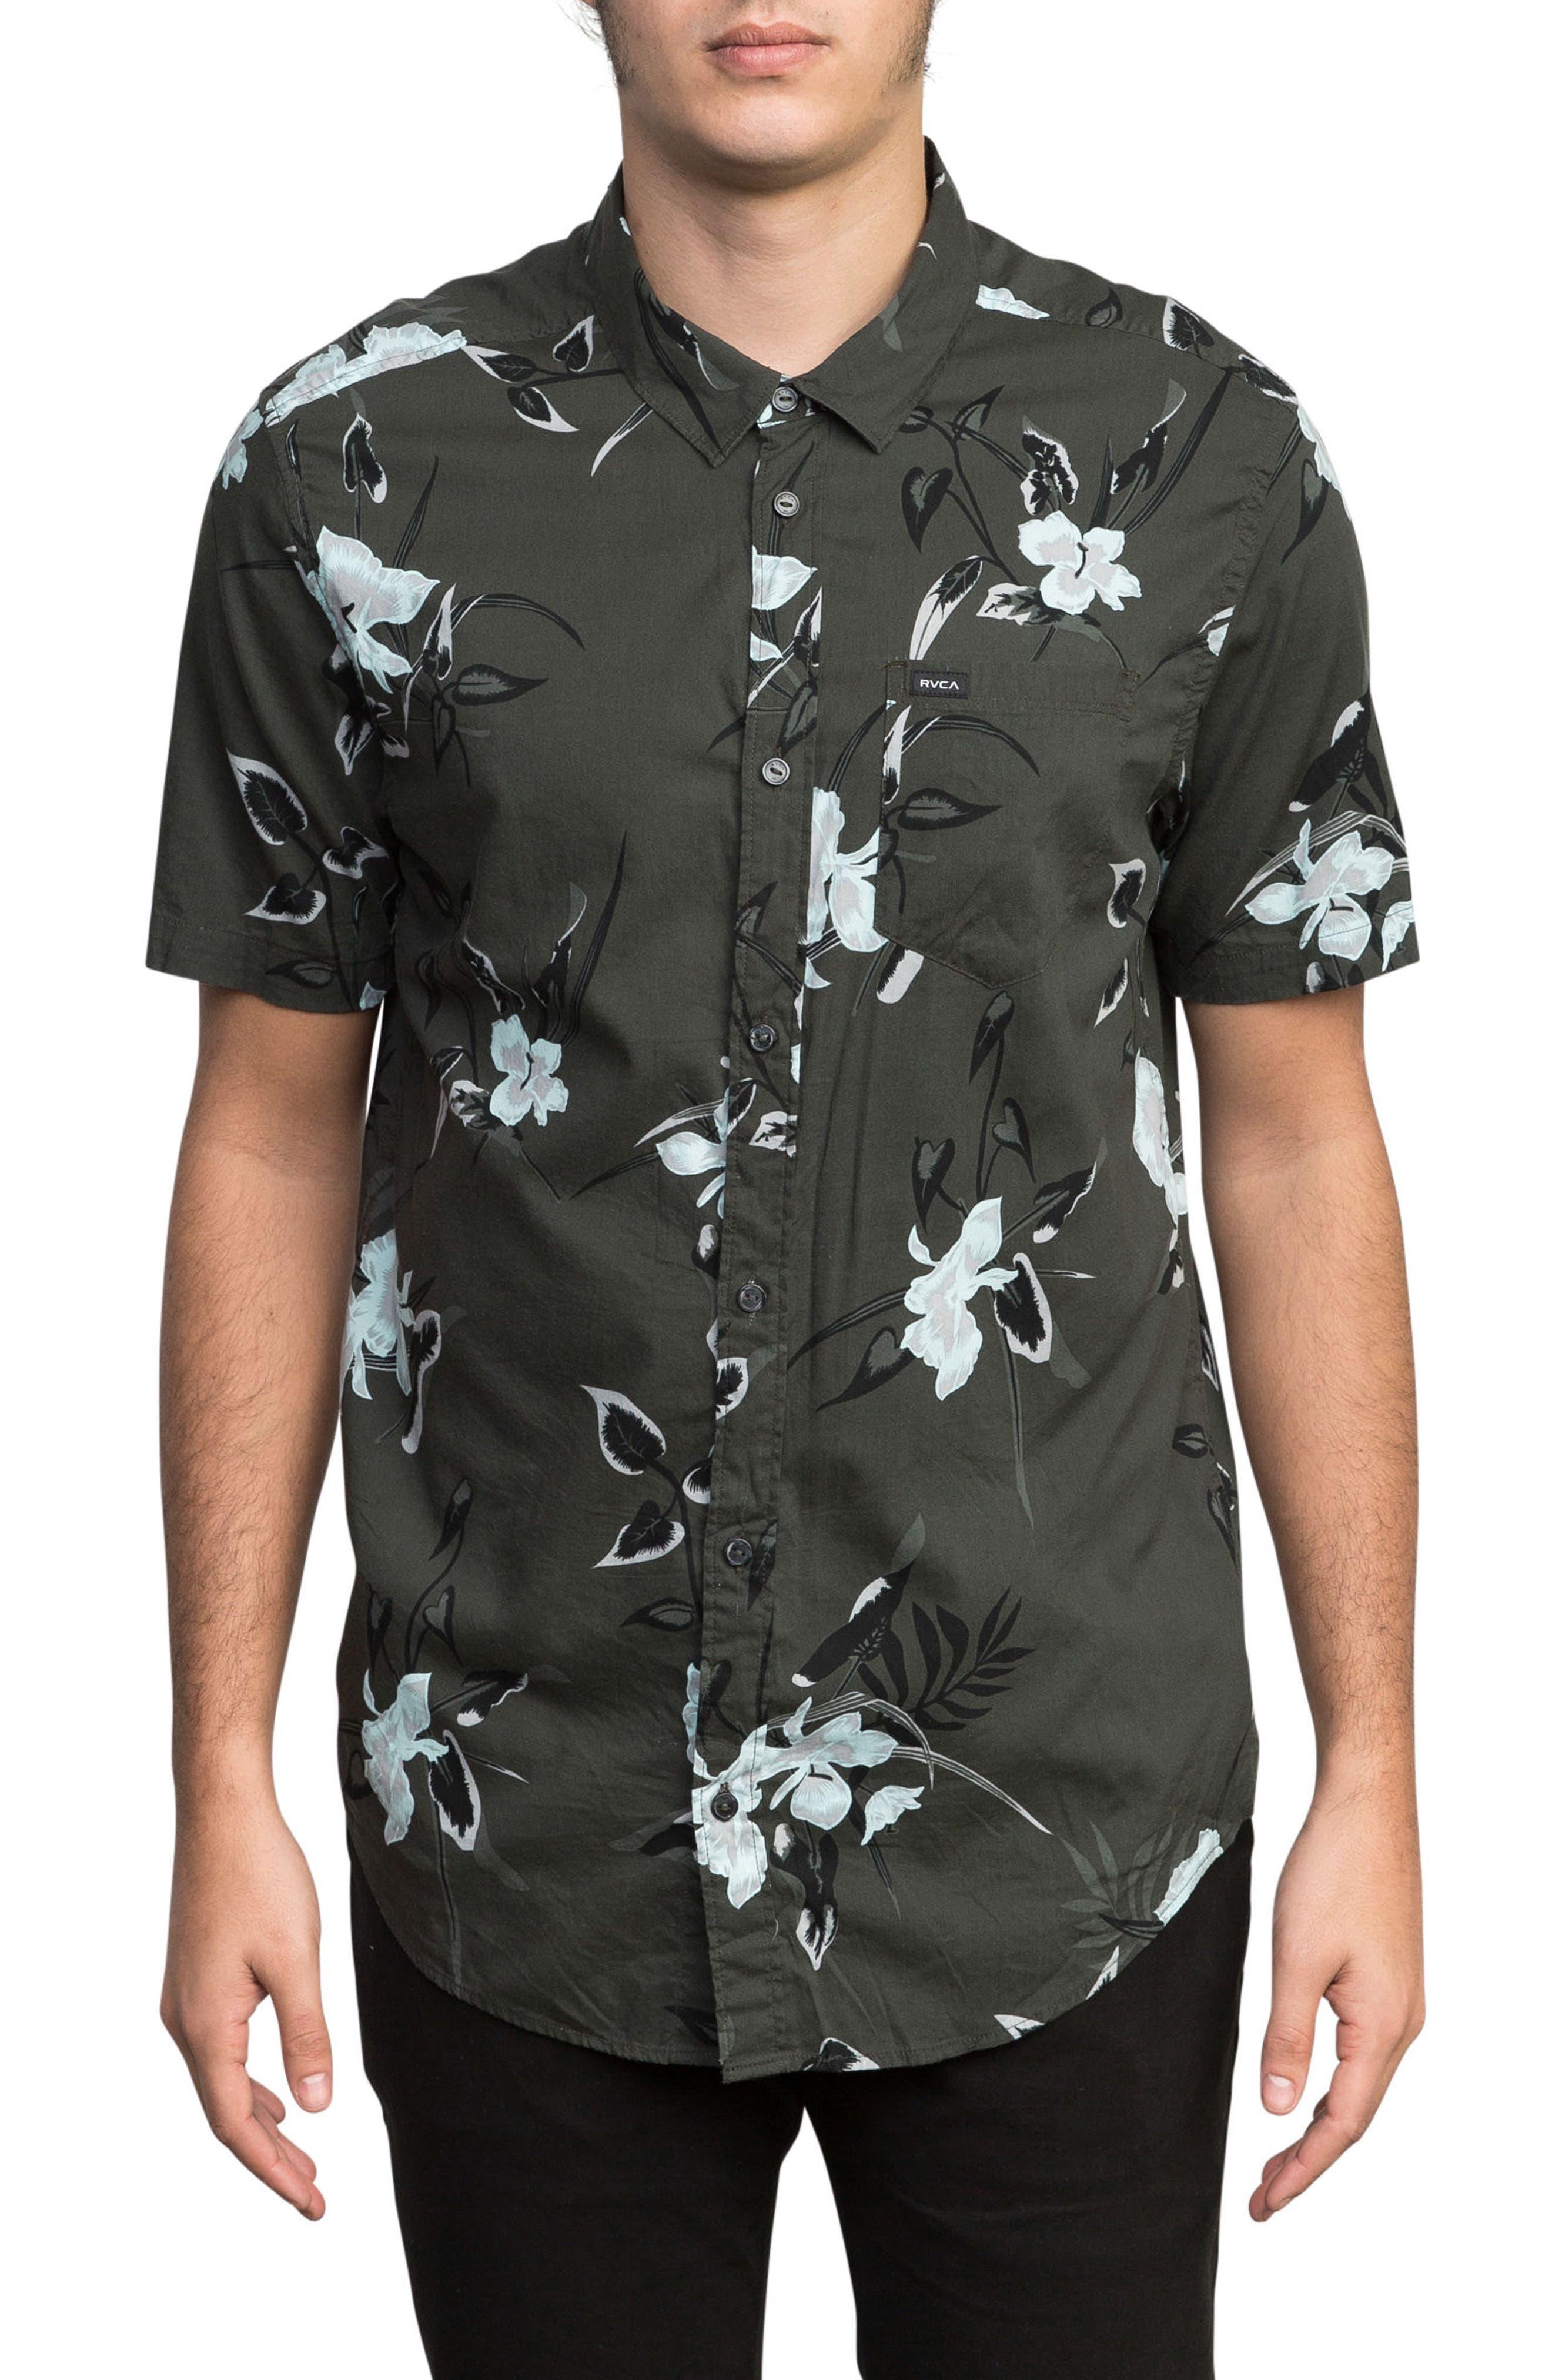 Moonflower Woven Shirt,                             Main thumbnail 1, color,                             008